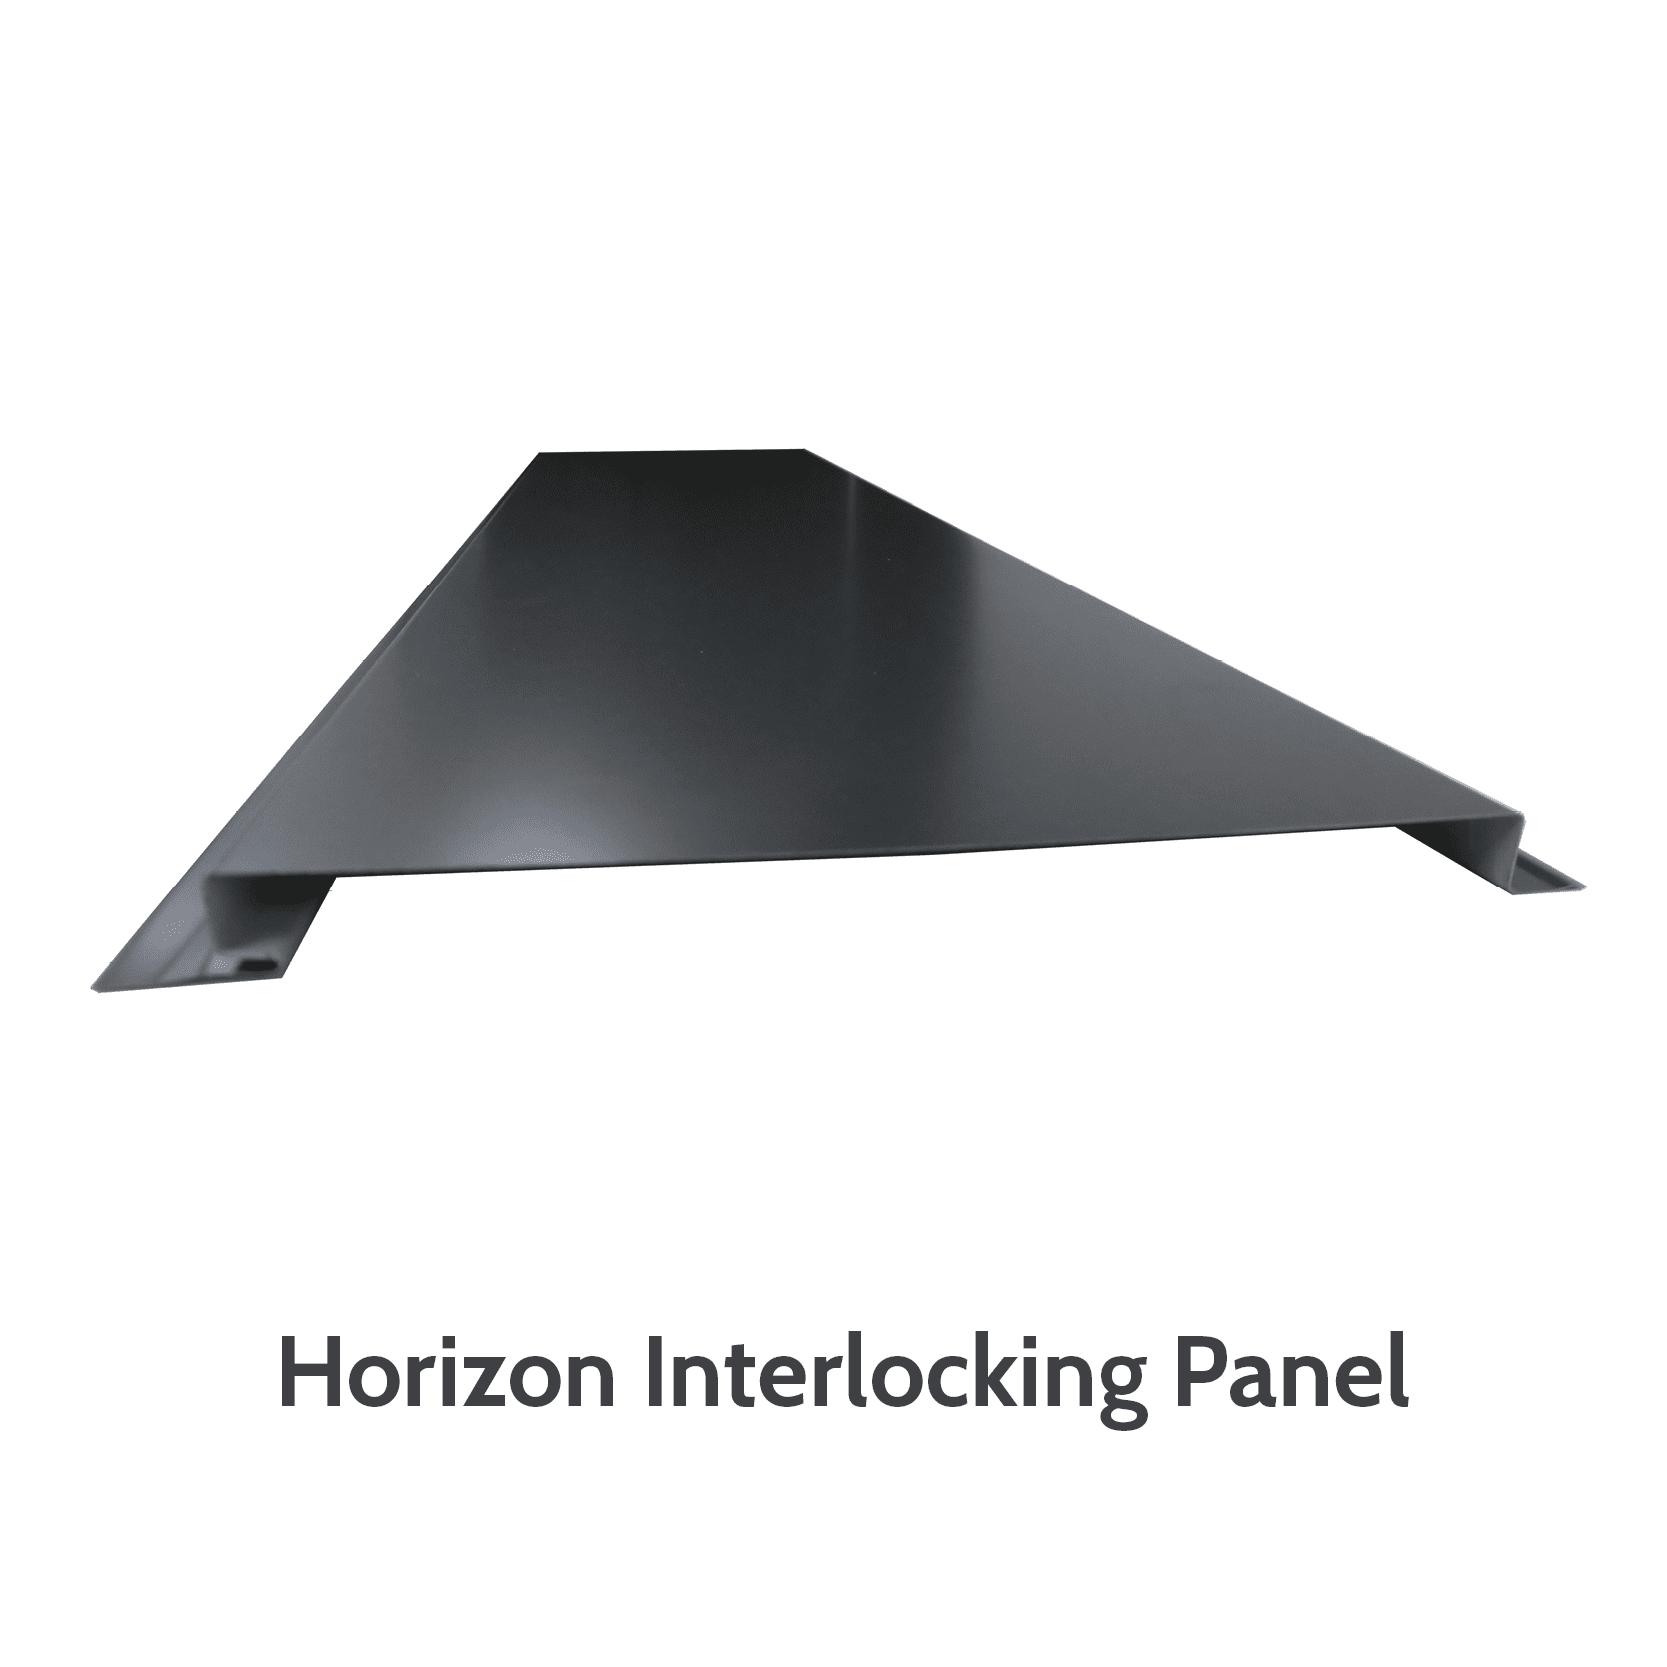 Horizon Interlocking Panel